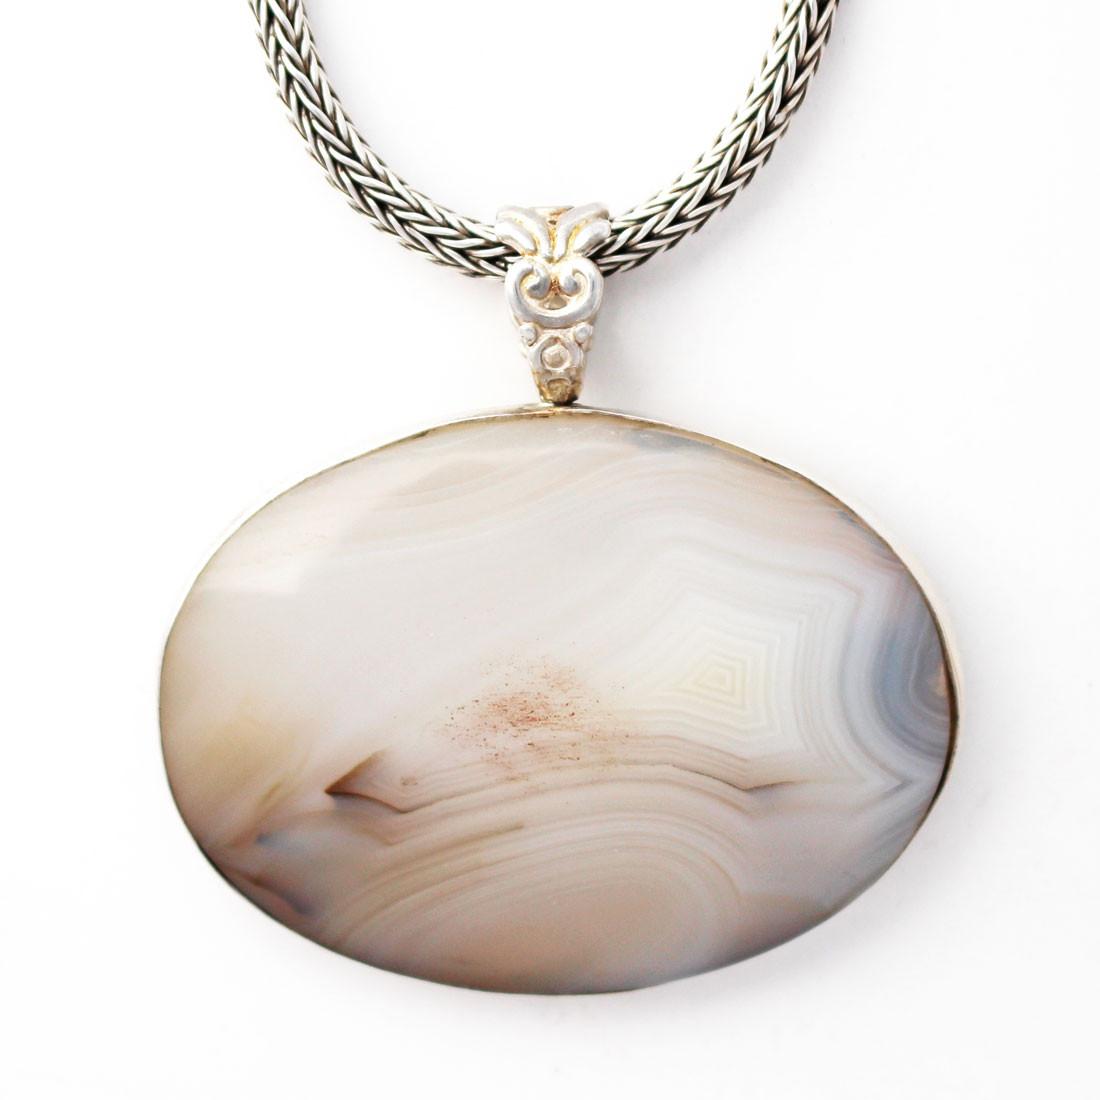 Handmade Oval White Agate Pendant Sterling Silver